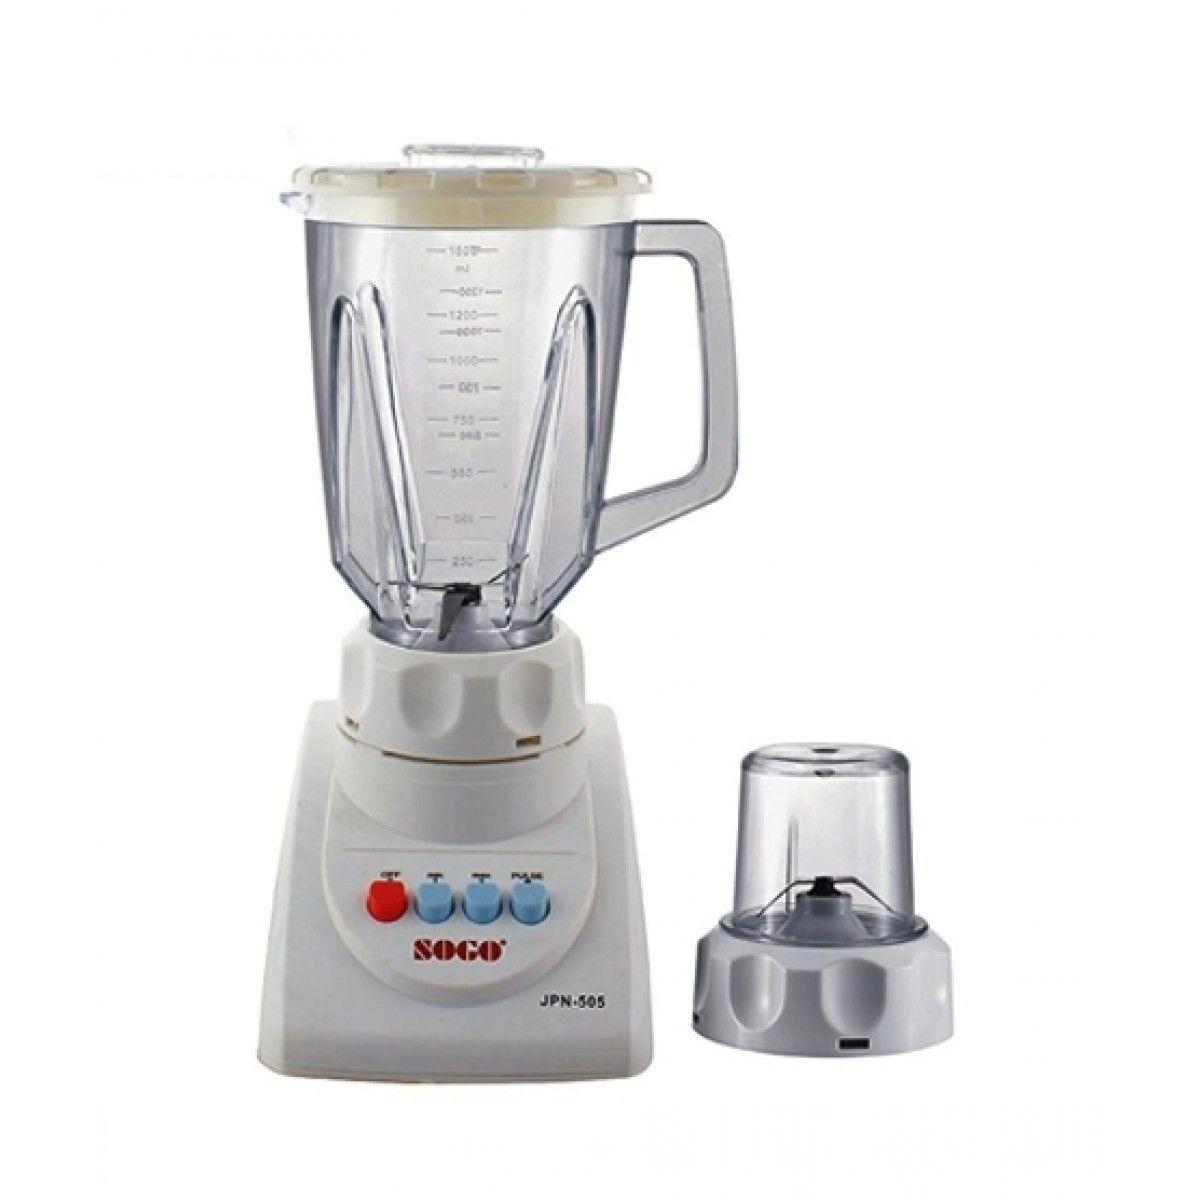 Sogo JPN-505 2 In 1 Juicer Blender